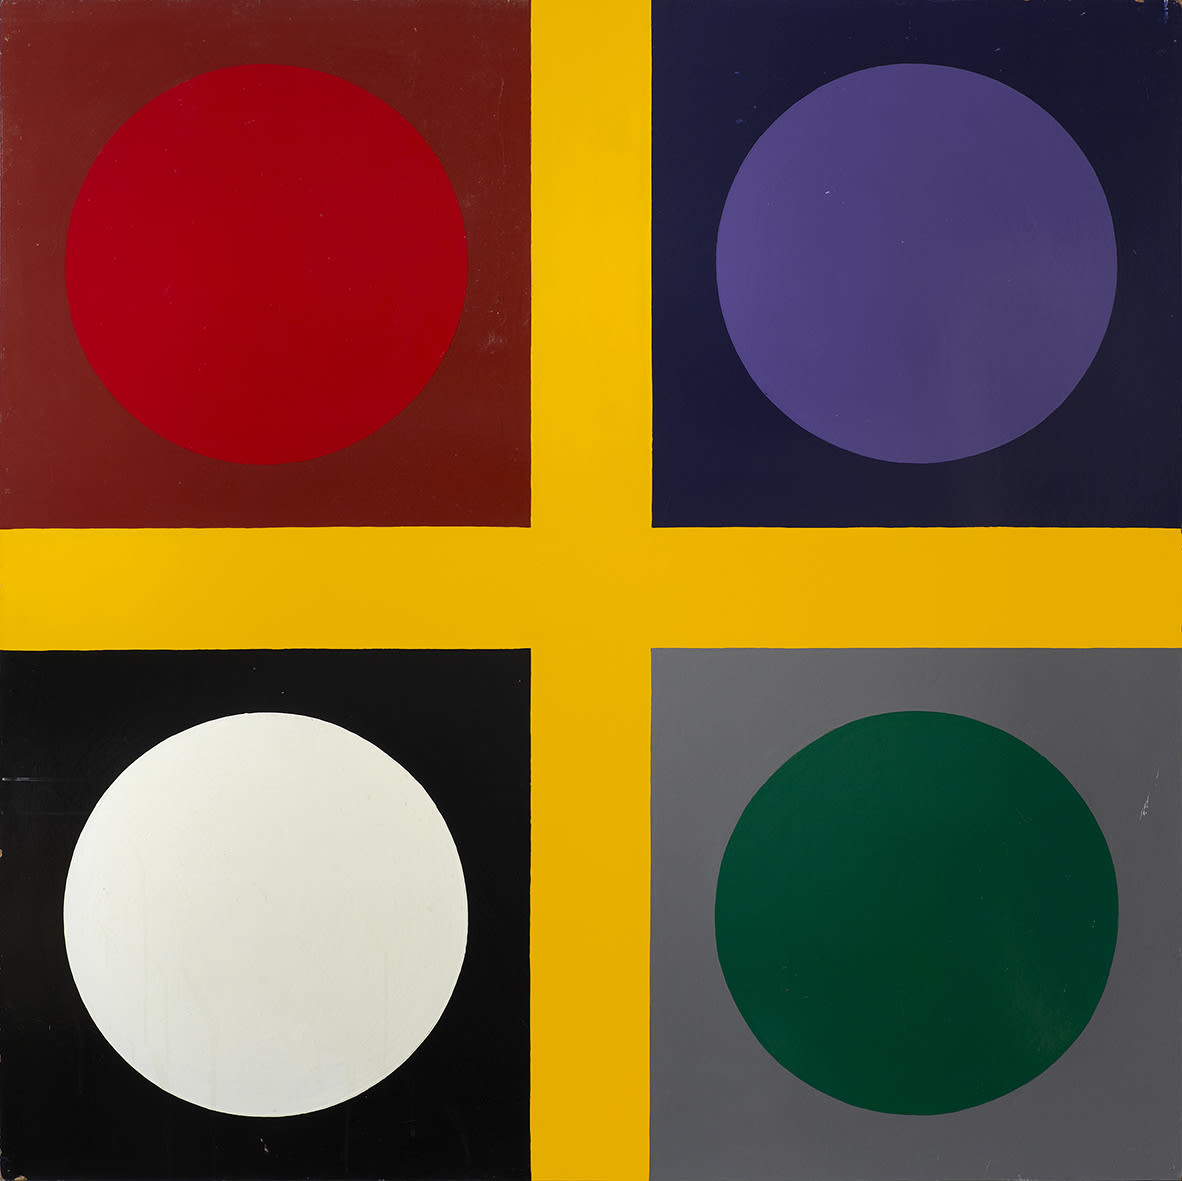 "<span class=""link fancybox-details-link""><a href=""/exhibitions/143/works/artworks11007/"">View Detail Page</a></span><div class=""artist""><strong> Poul Gernes</strong></div><div class=""title""><em>Untitled (tic tac toe painting)</em>, 1967</div><div class=""medium"">enamel paint on masonite</div><div class=""dimensions"">160.0 x 160.0 cm<br>62 15/16 x 62 15/16 in</div>"